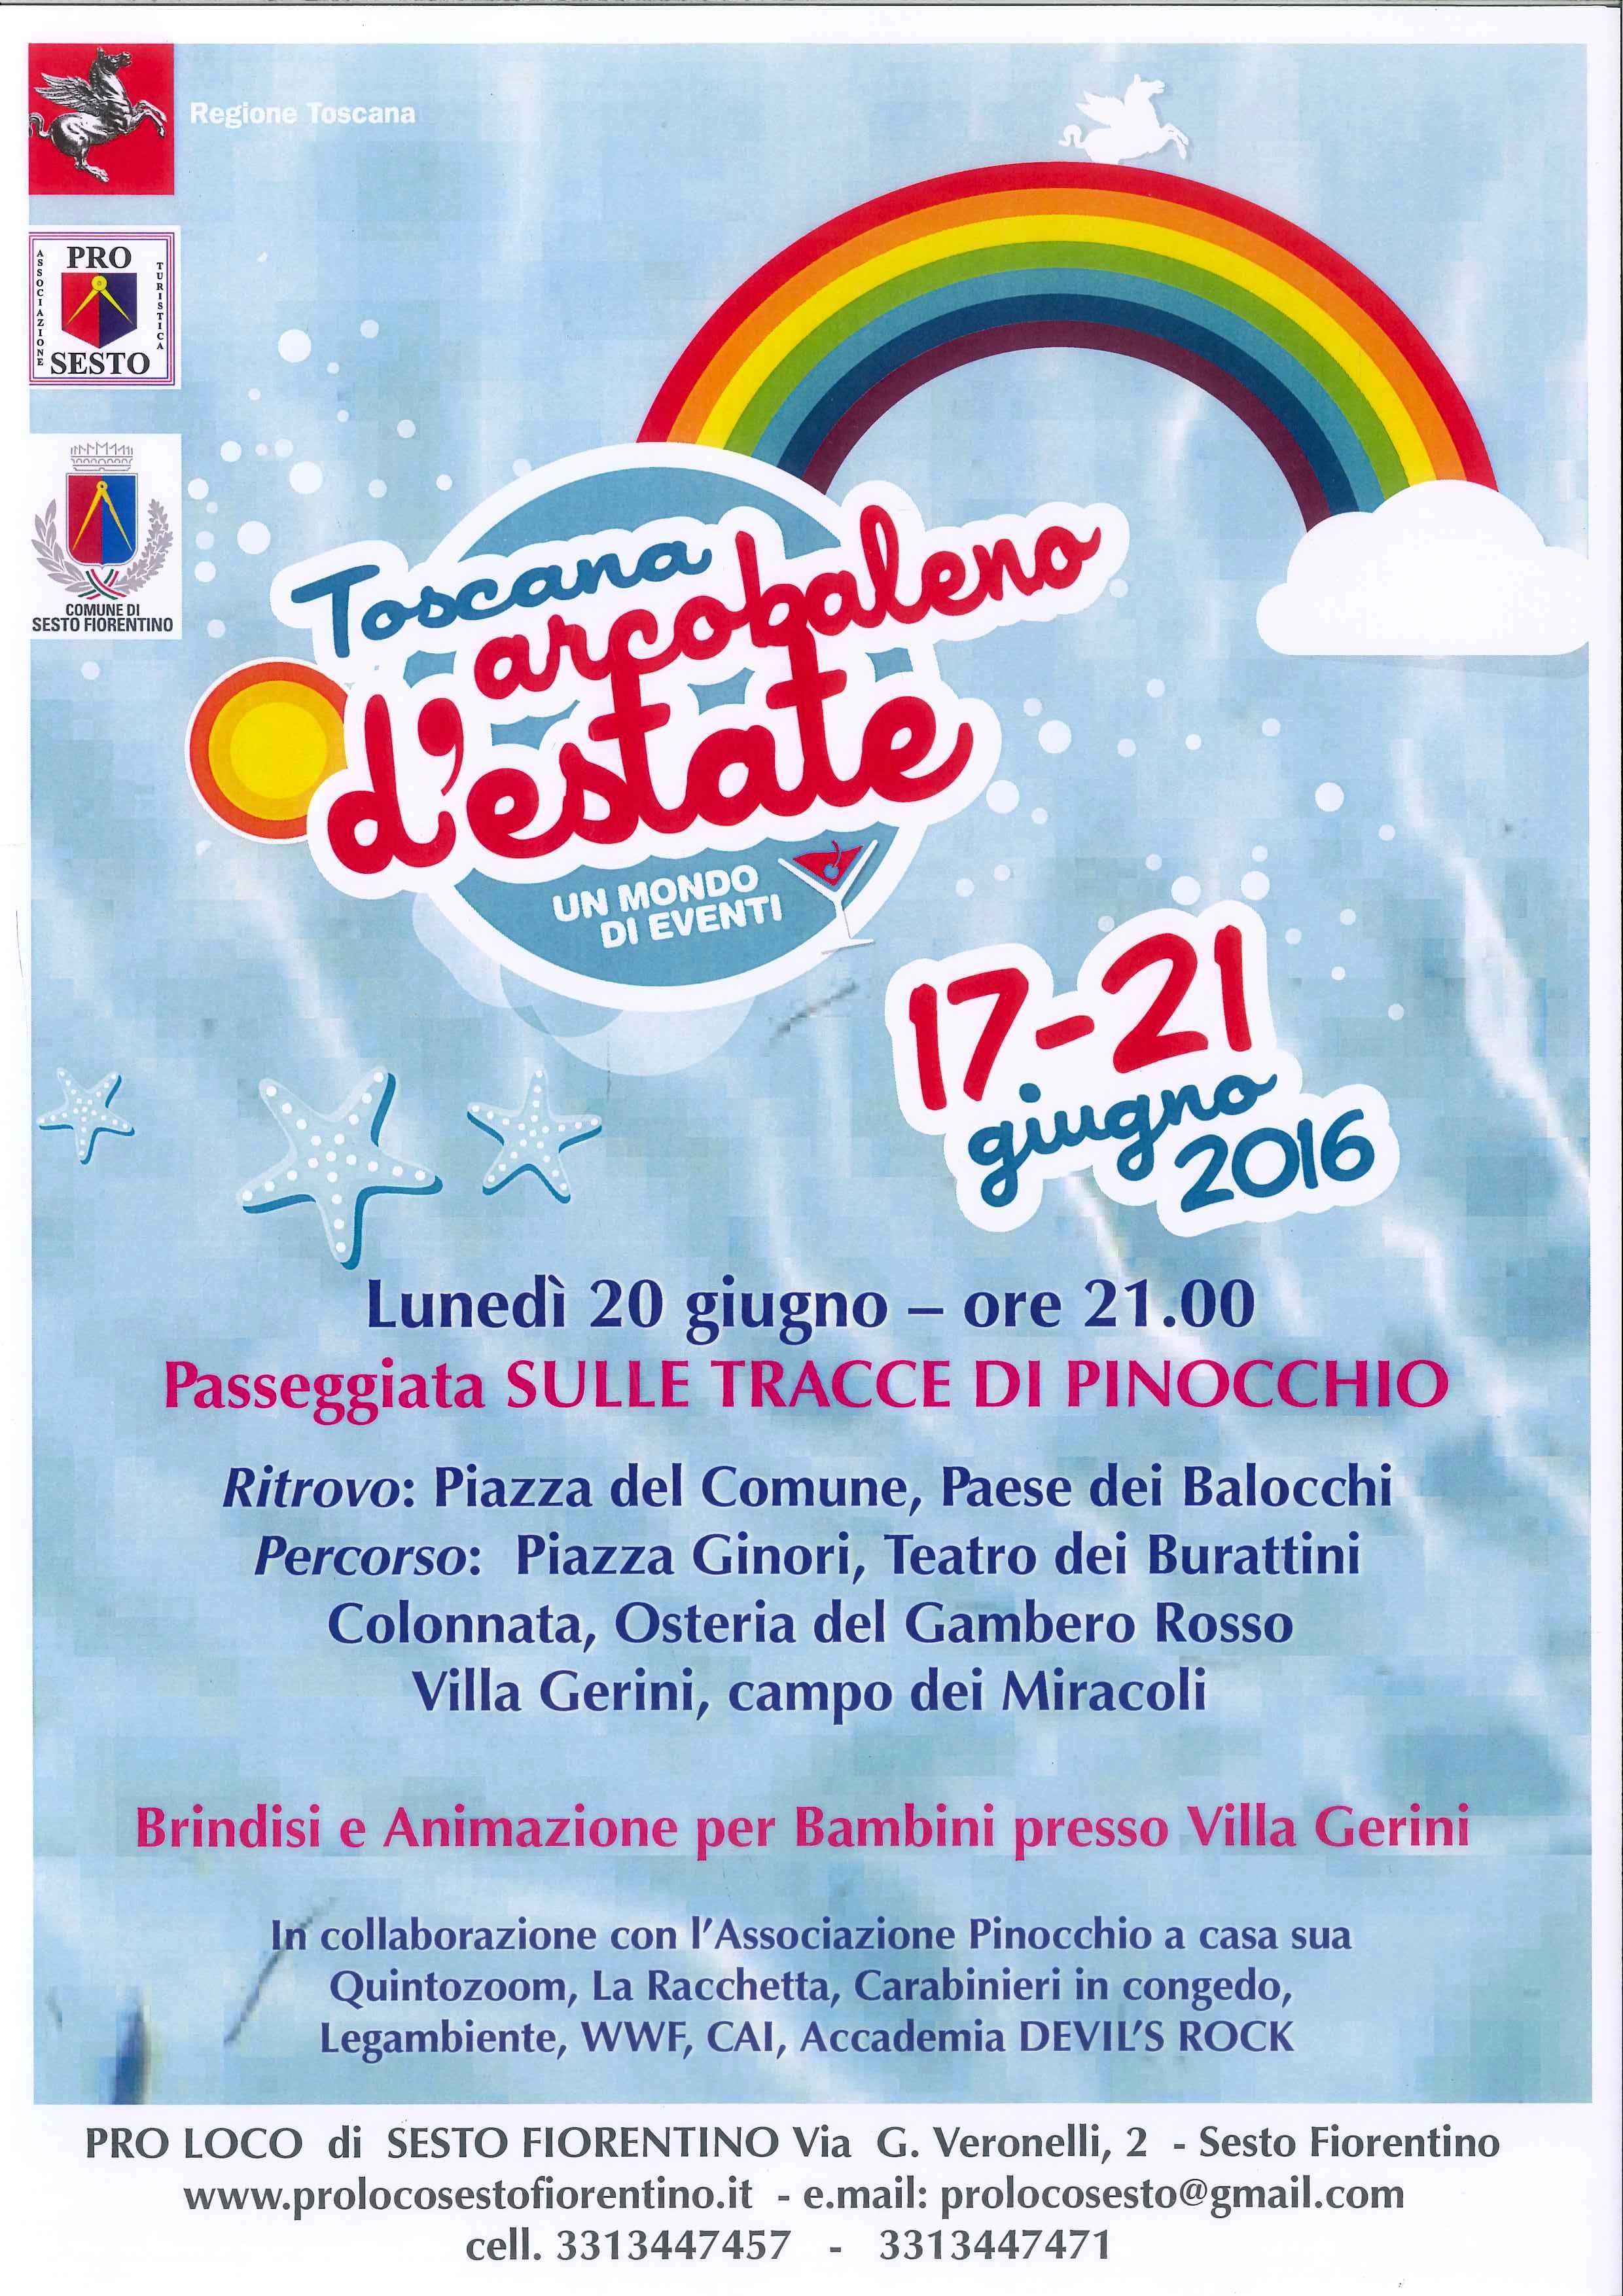 Toscana Arcobaleno Estate 2016